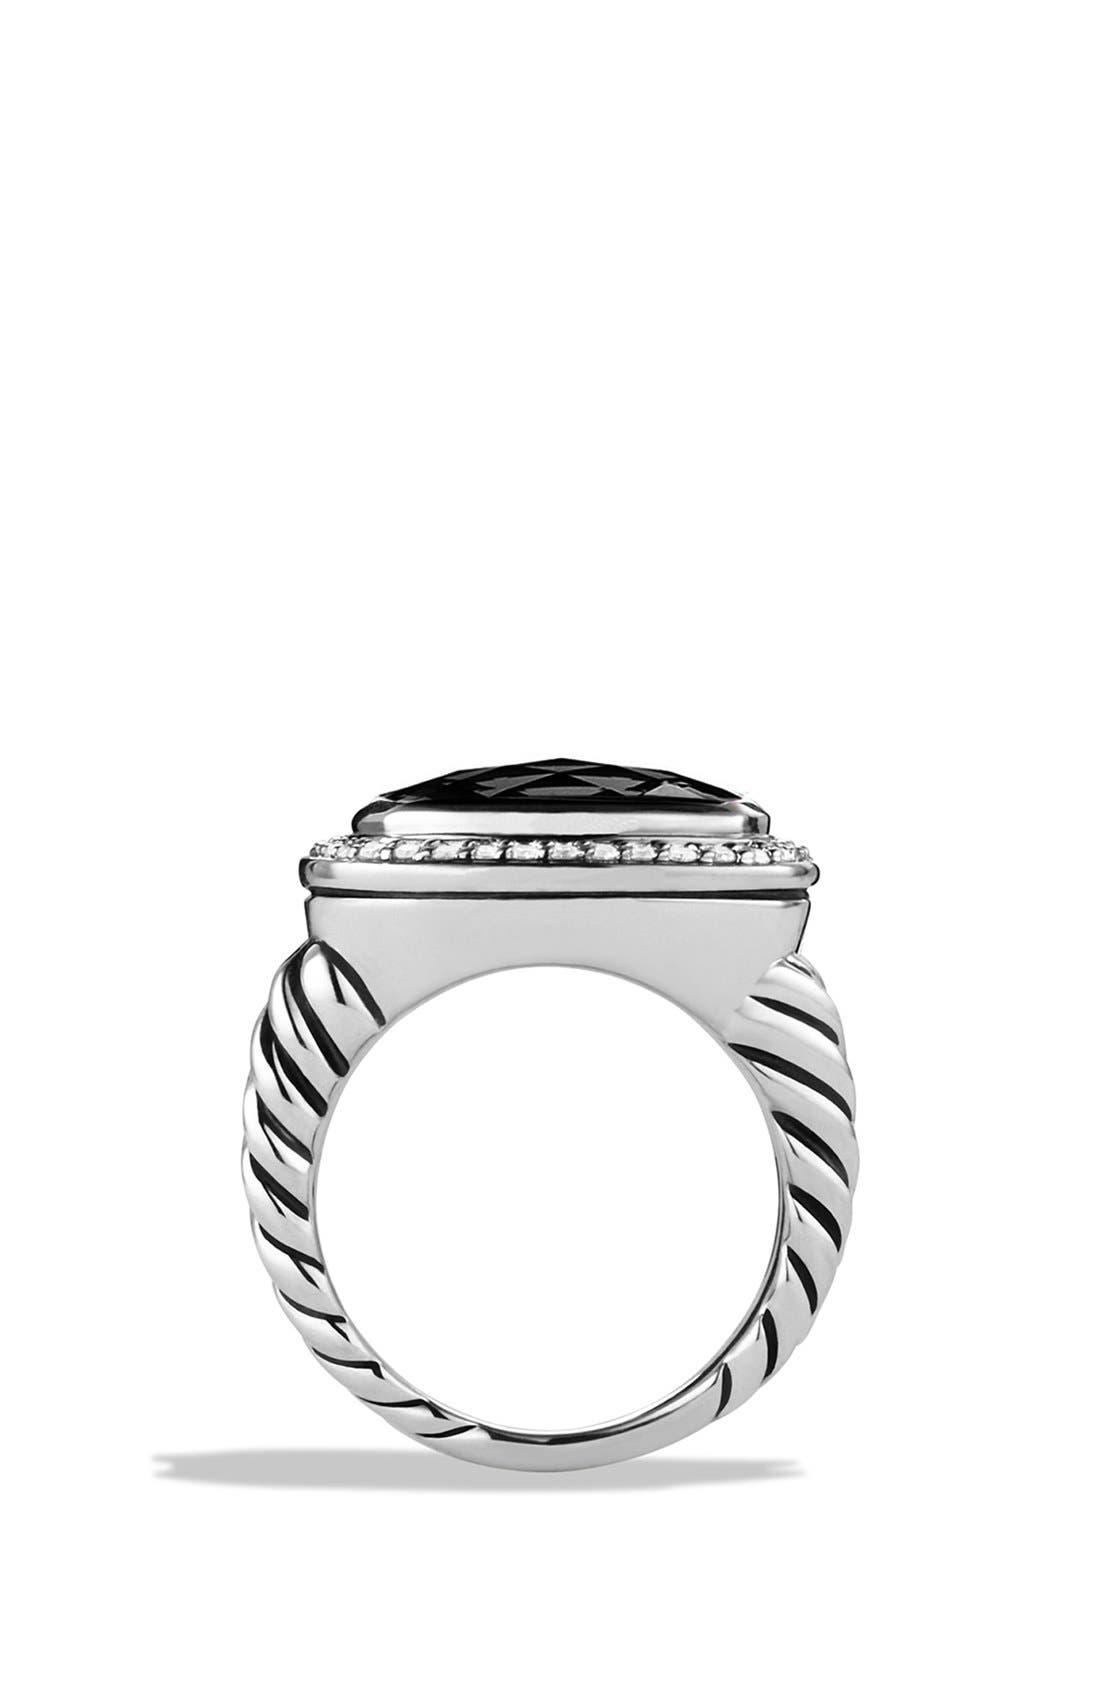 'Albion' Ring with Semiprecious Stone & Diamonds,                             Alternate thumbnail 3, color,                             001